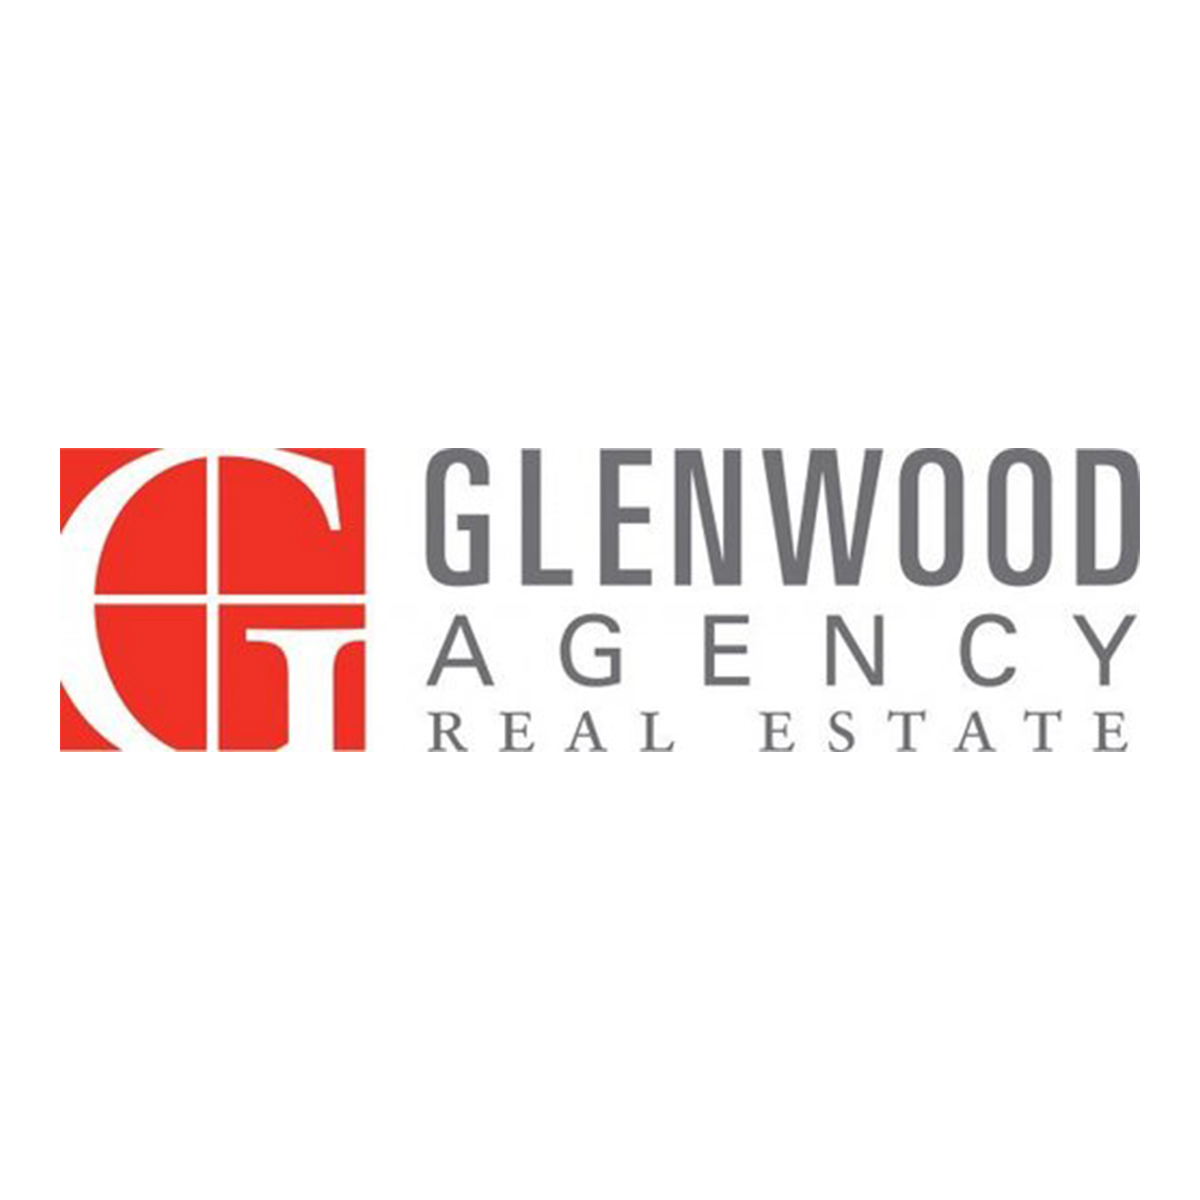 Web_Glenwood.jpg